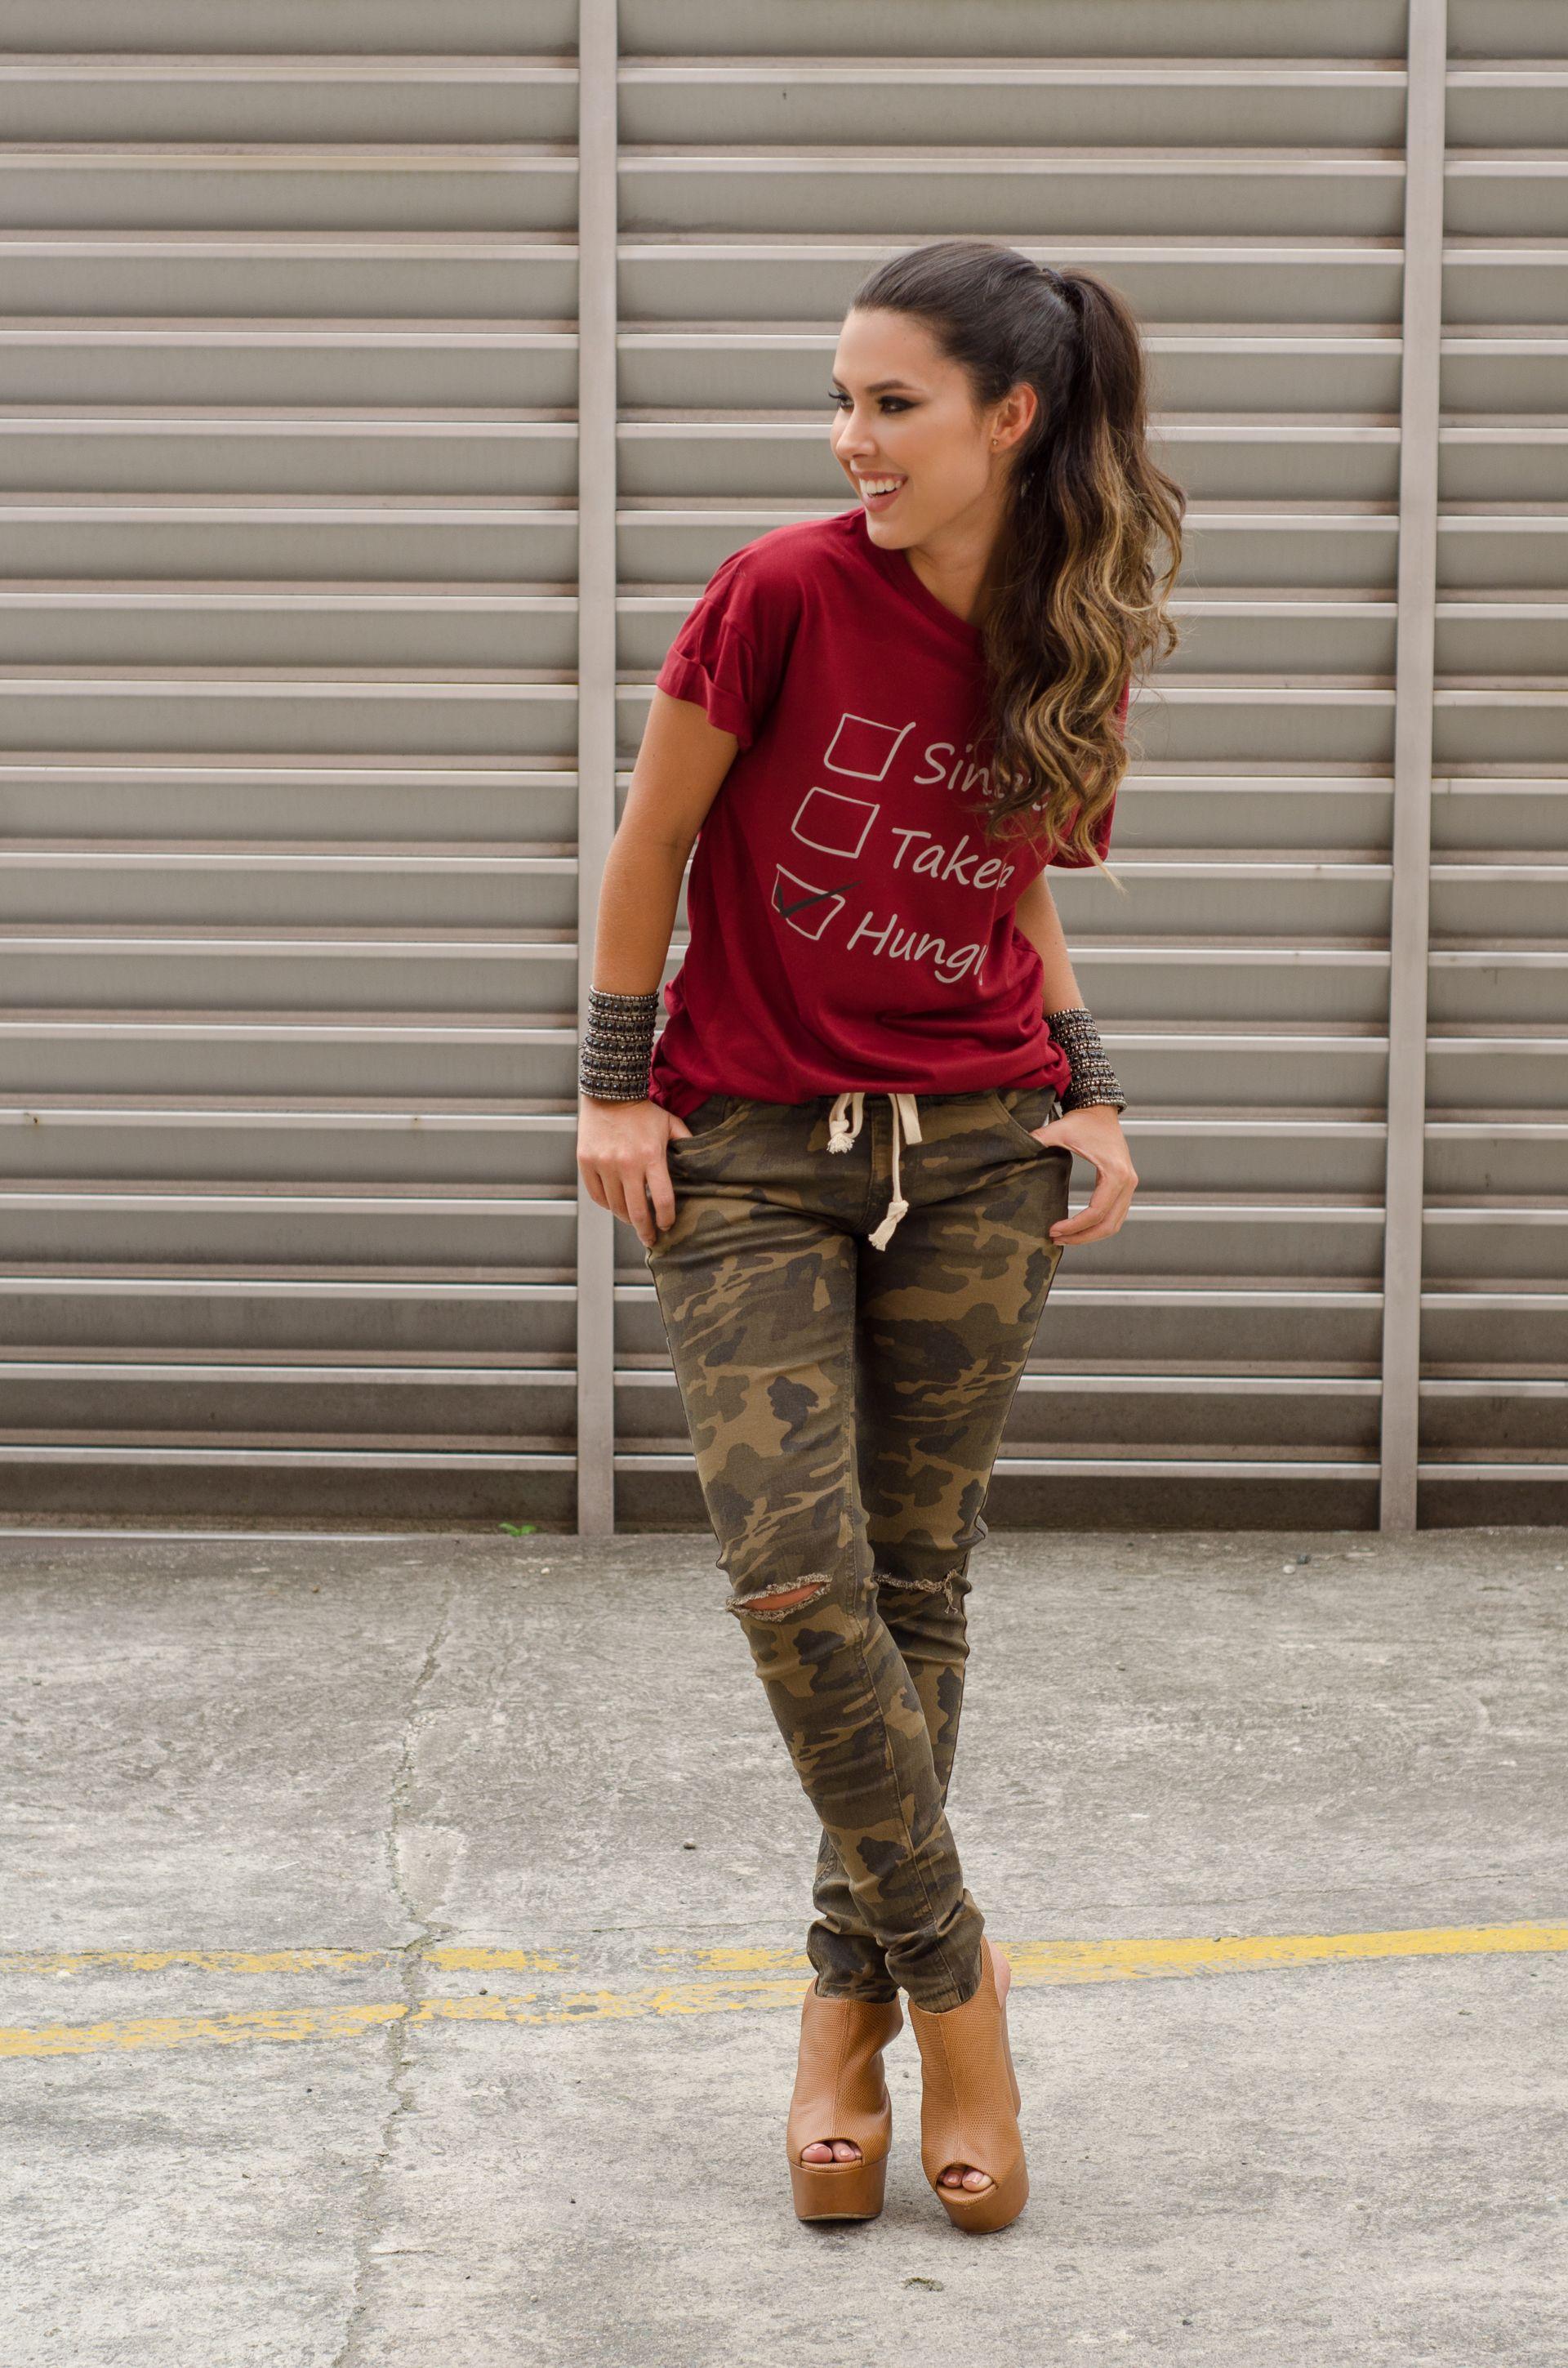 cd4d71c6158 T-shirts nnocence Cloth Bracelet Pants Army Camiseta Brazalete Camiseta  Brazalete Pantalón Militar